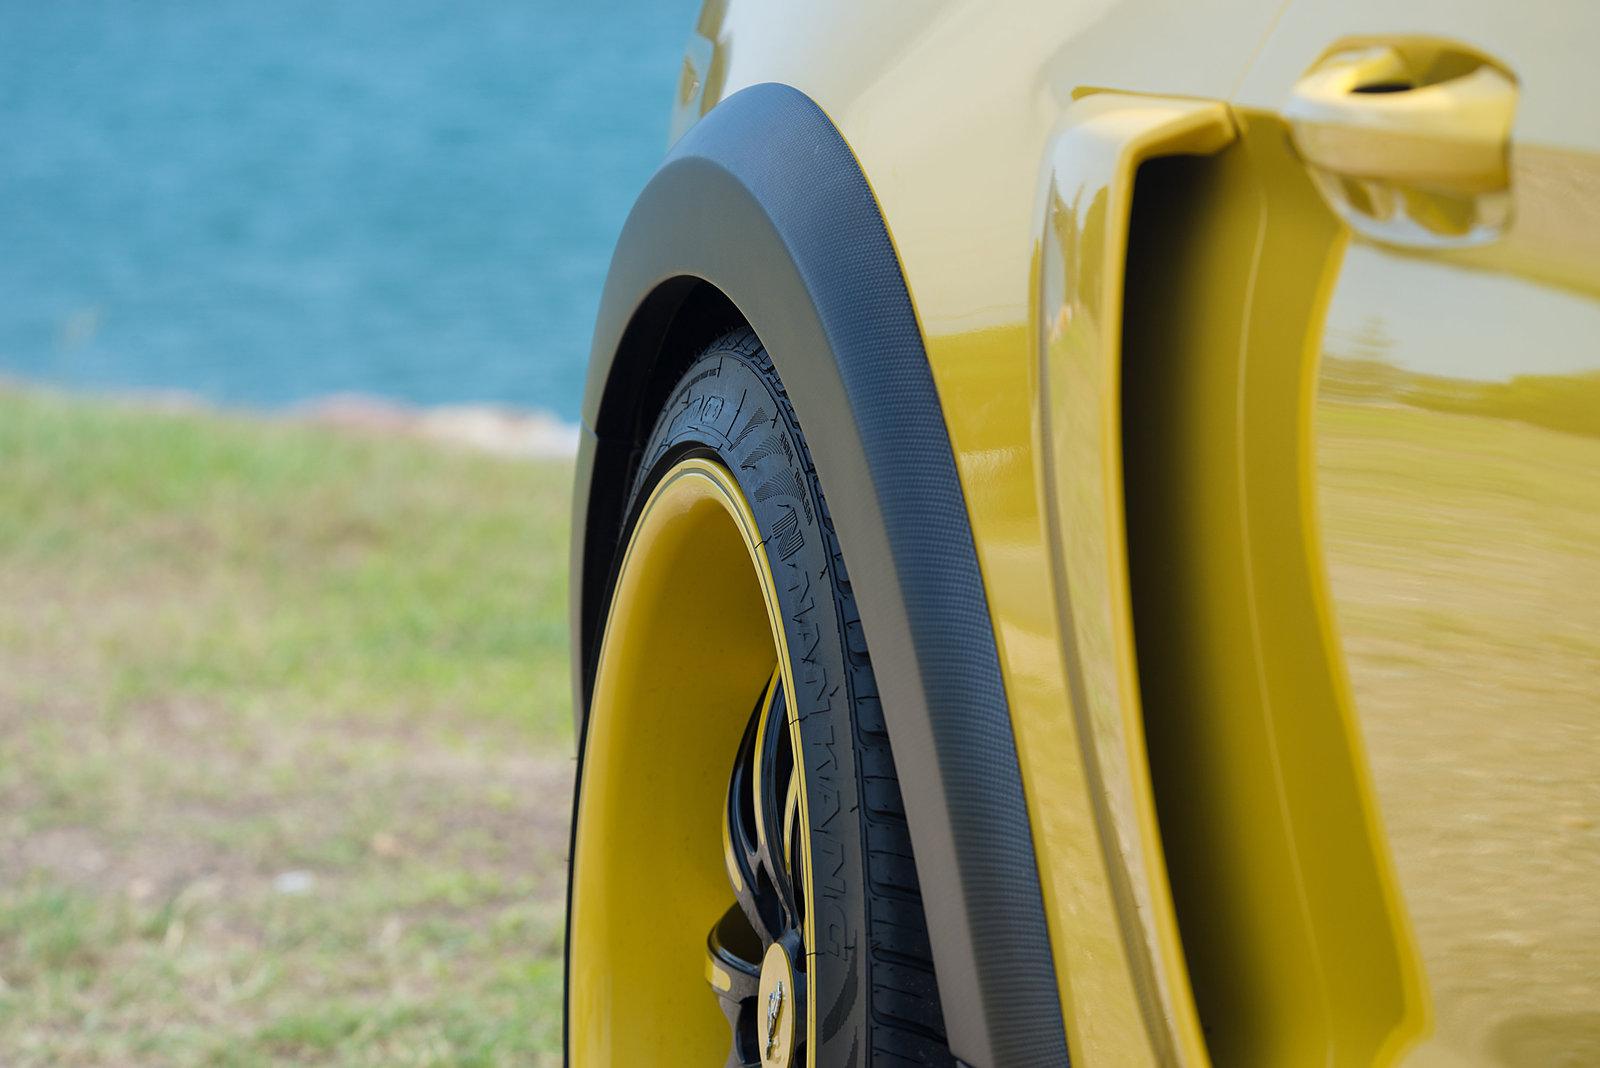 Mustang Side Scoops